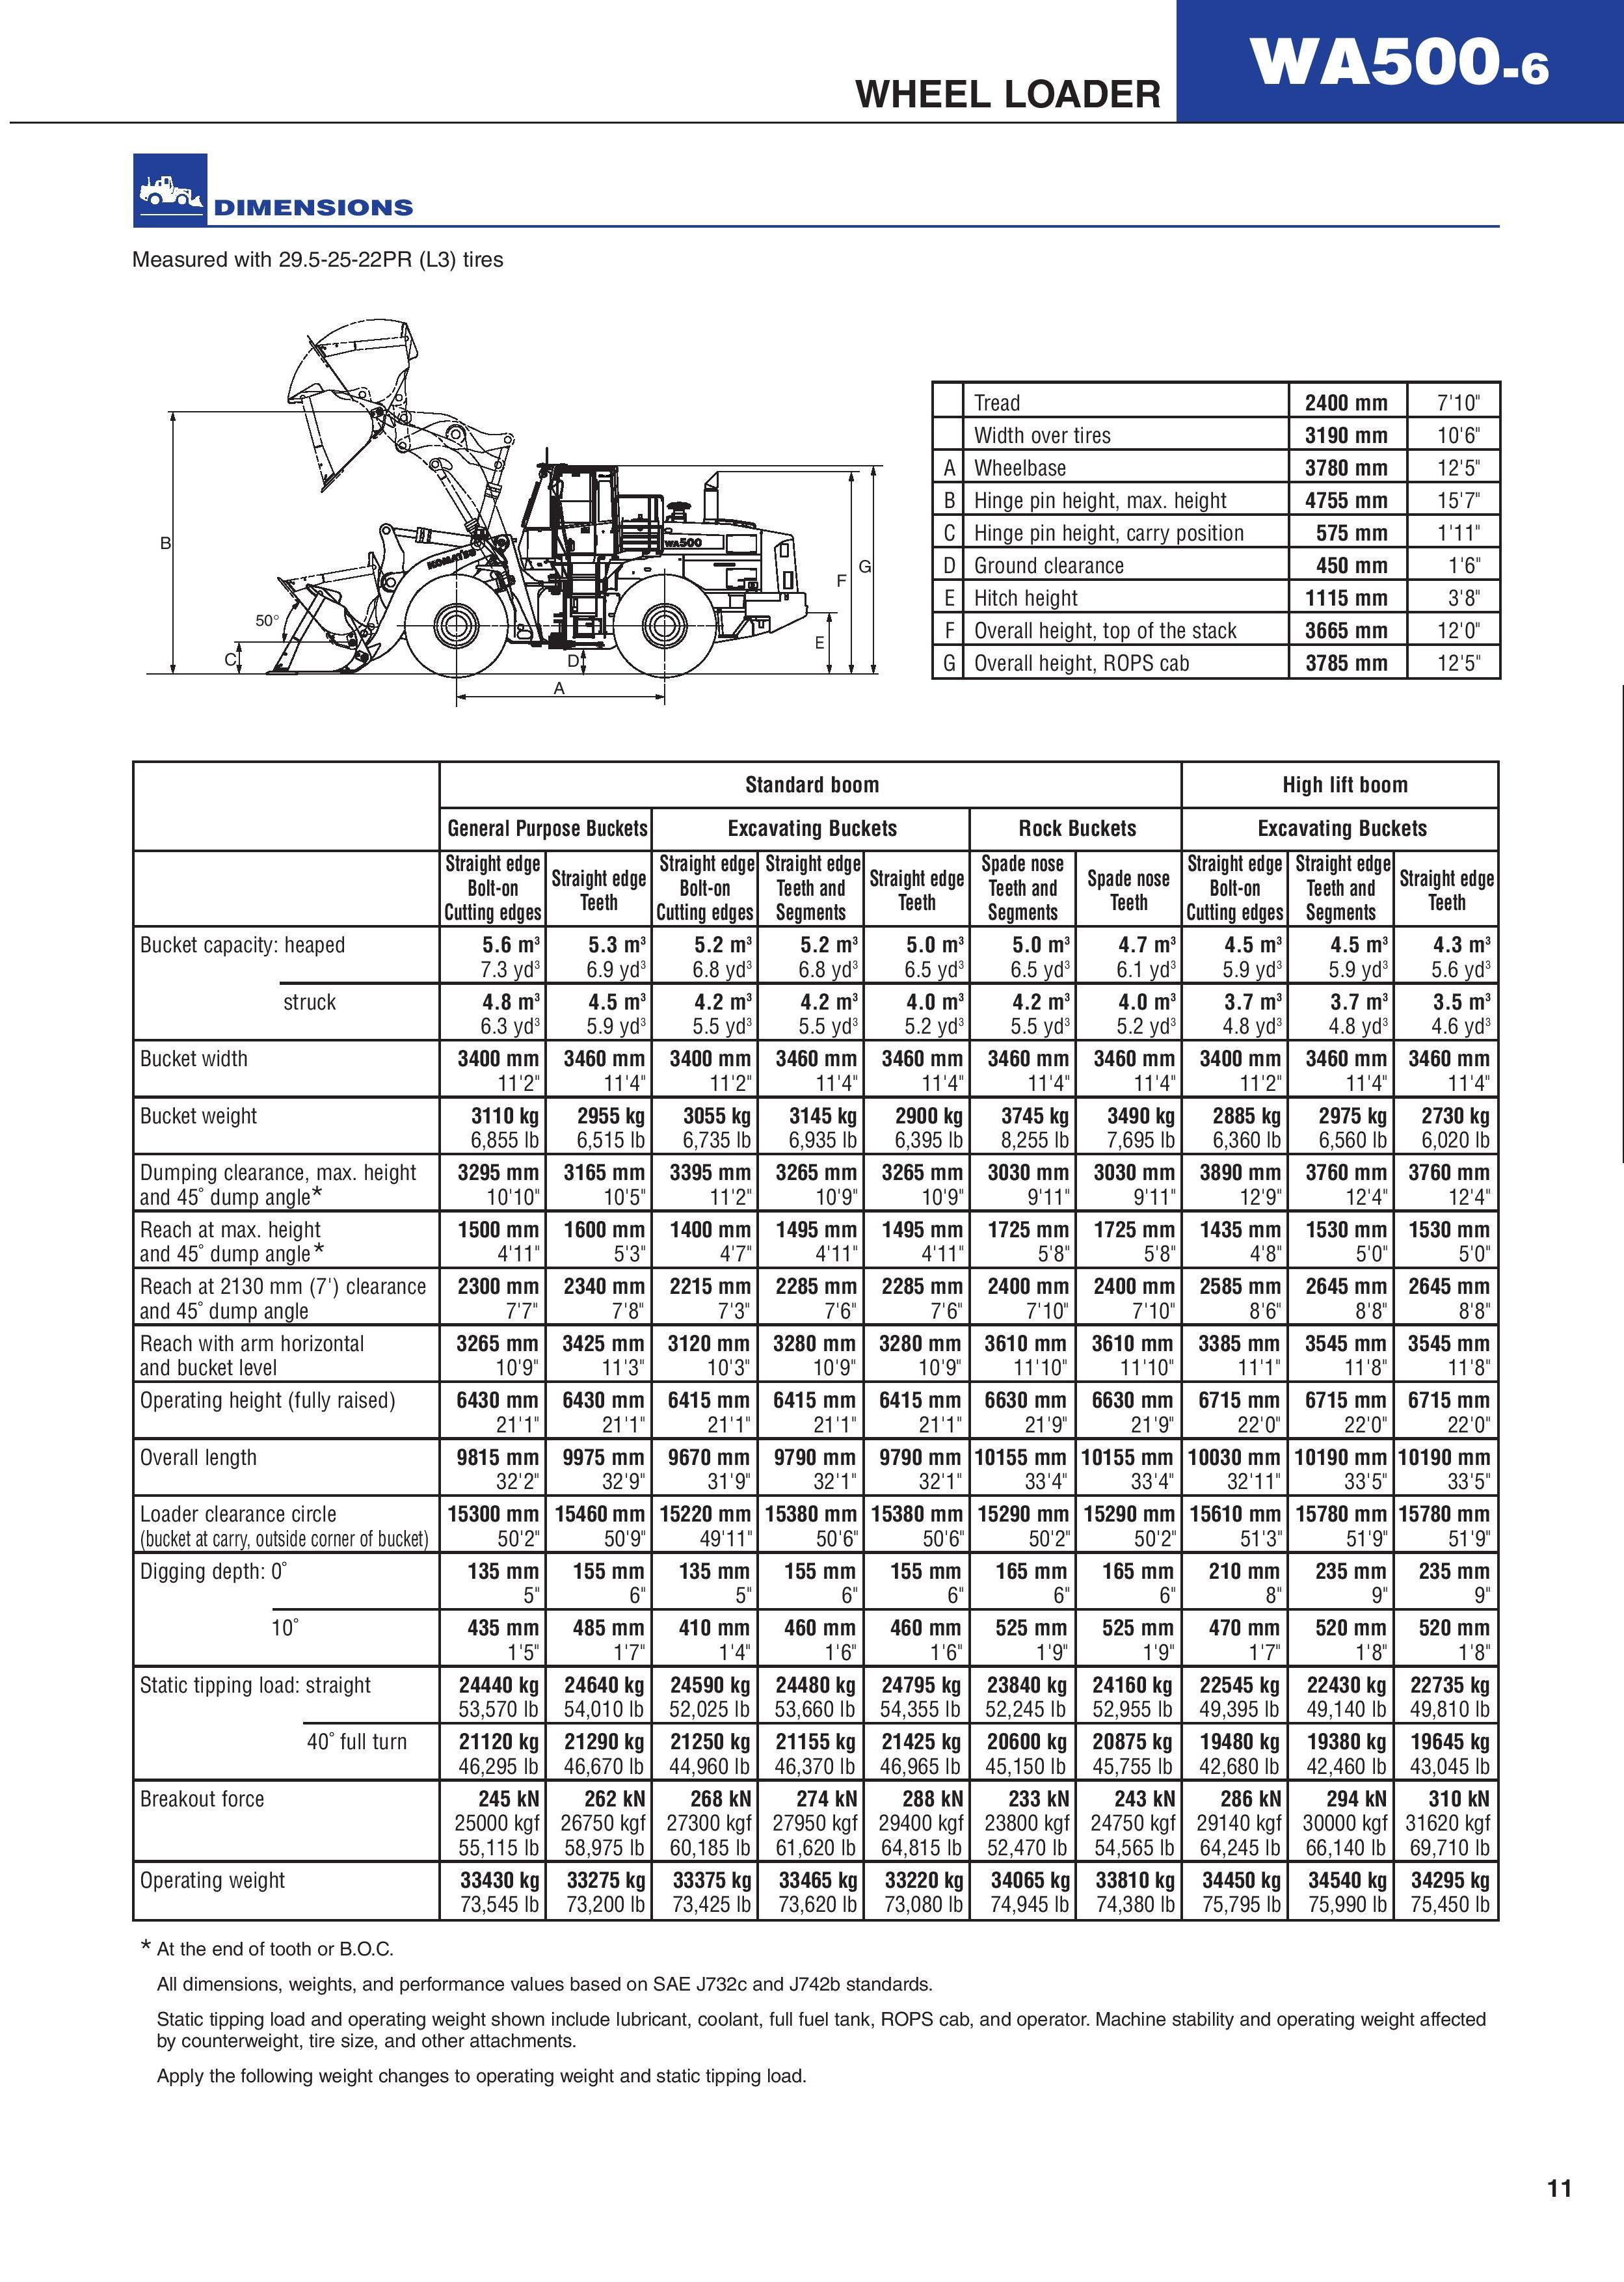 Komatsu Wheel Loader Supplier Worldwide Used Wa500 6